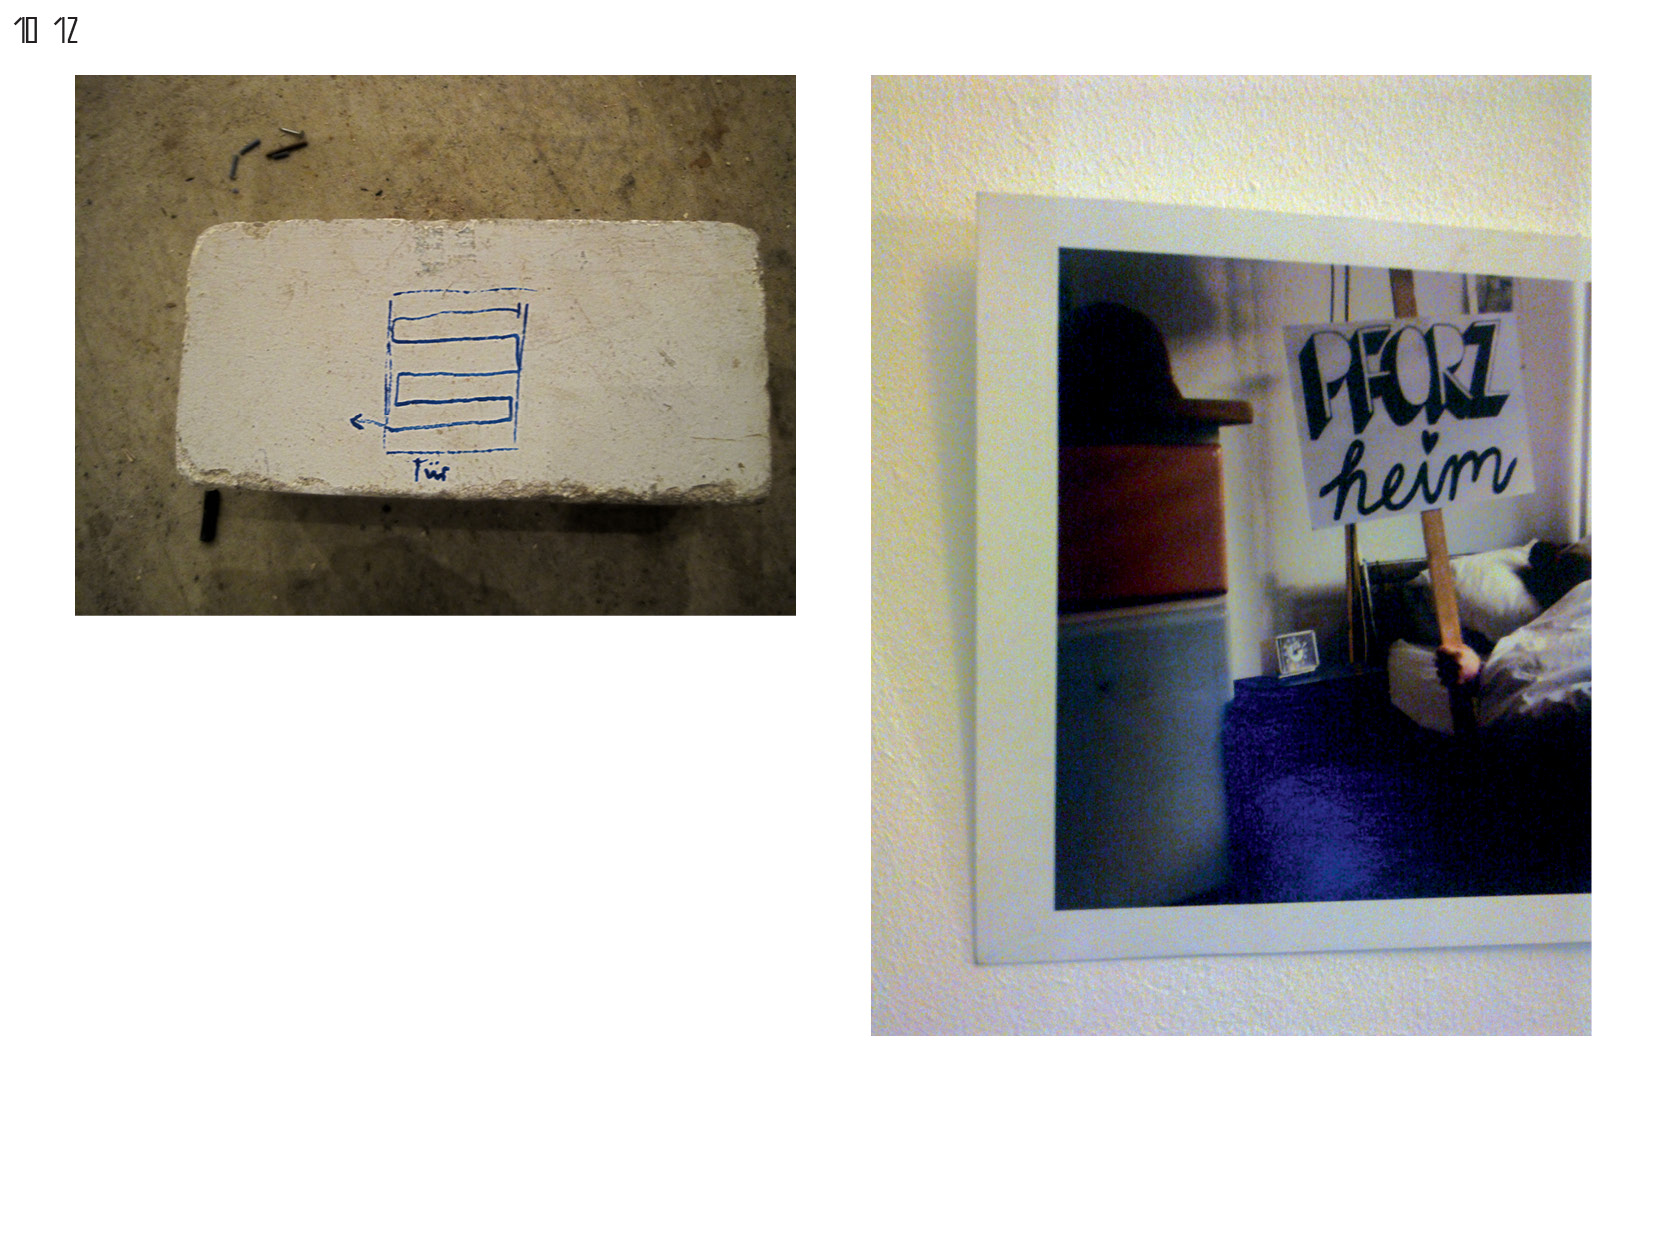 Gerrit-Schweiger-Dialog-Städte-Paris-Berlin-Jessica-Blank-Experiment-Fotoserie-Tagebuch-visuelle-Kommunikation-51